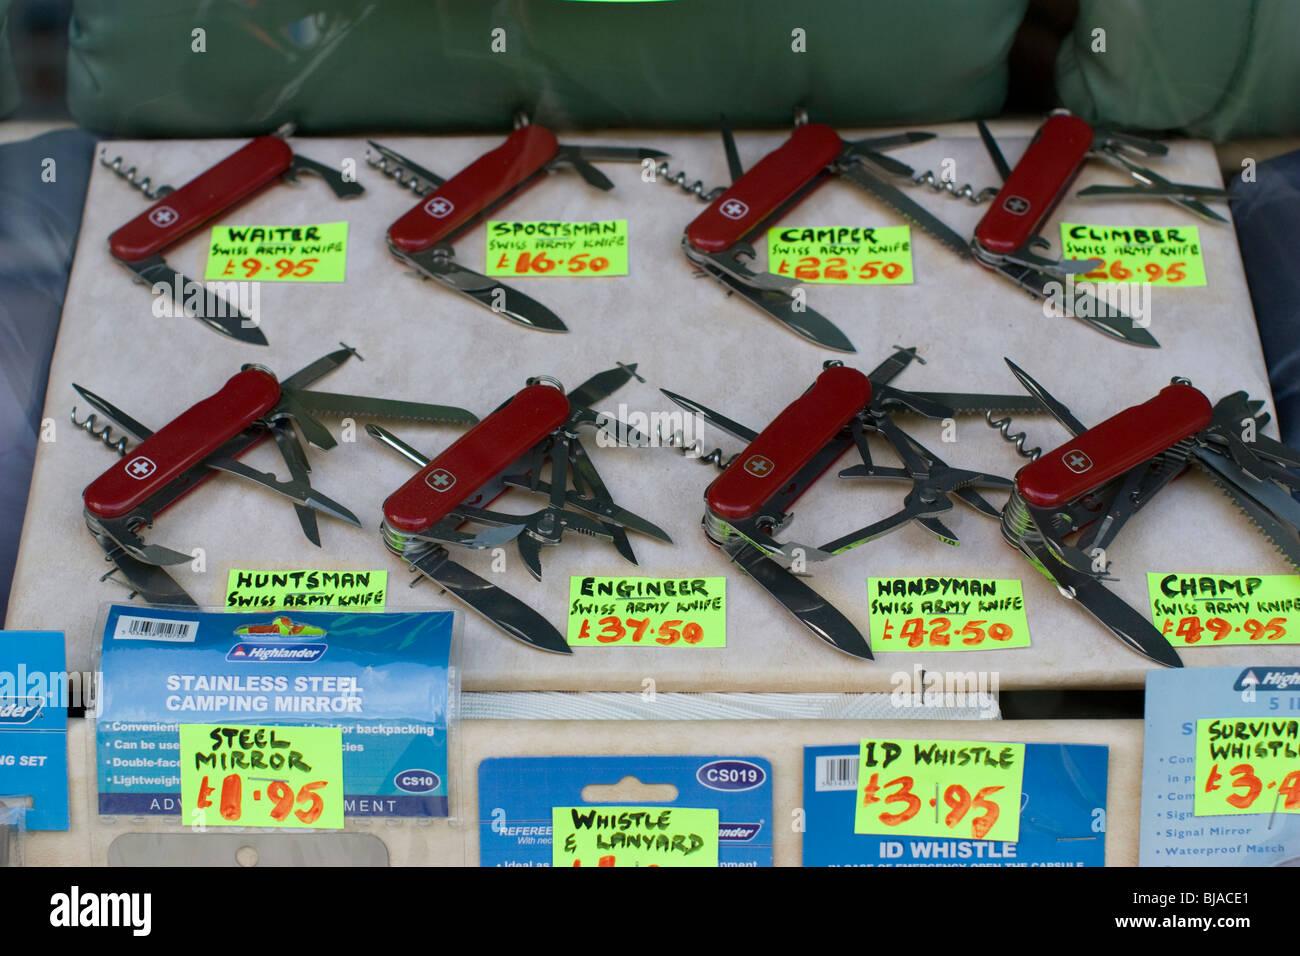 swiss army knife display in shop window UK - Stock Image